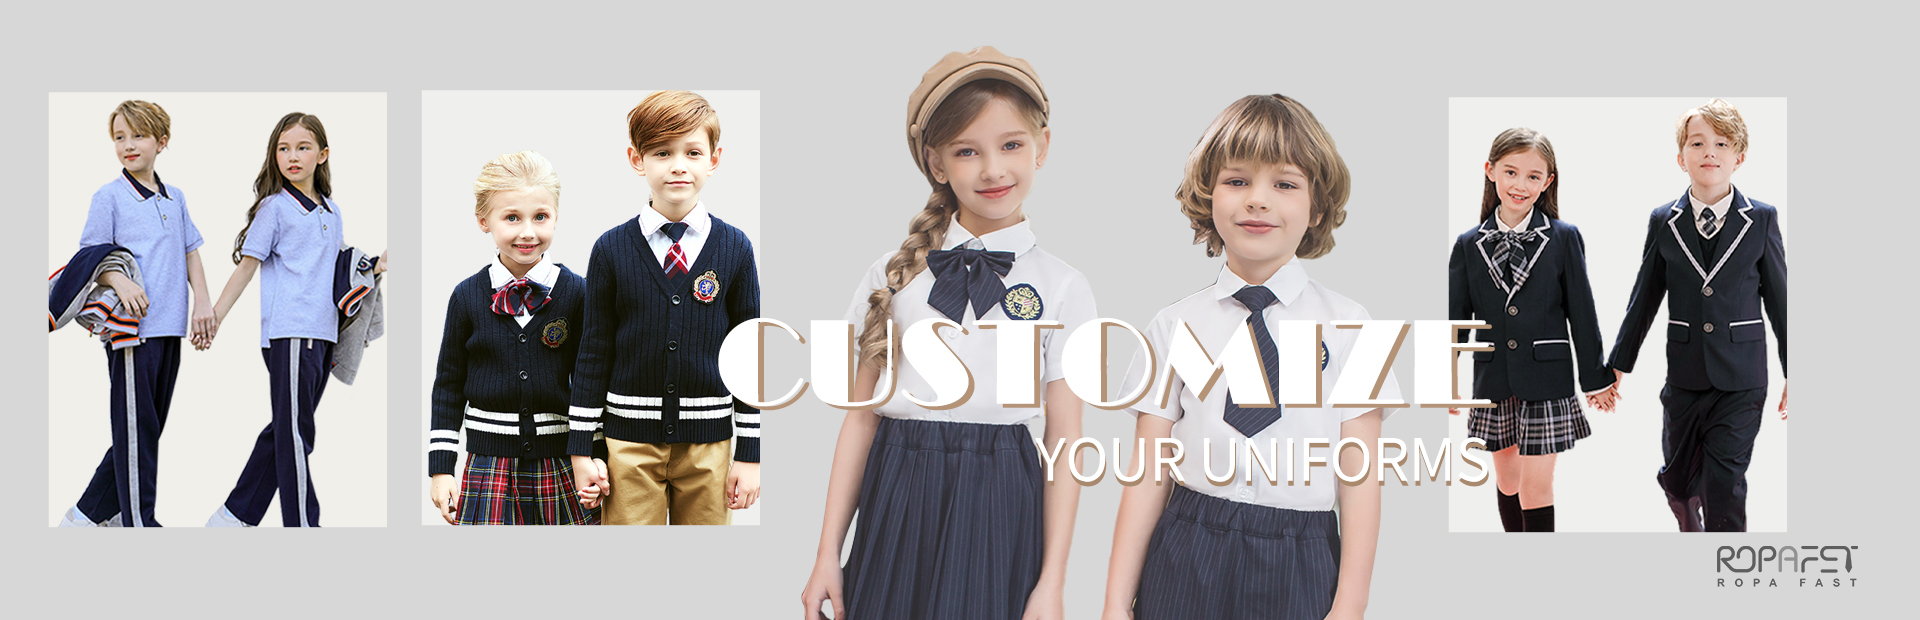 Customize your uniforms